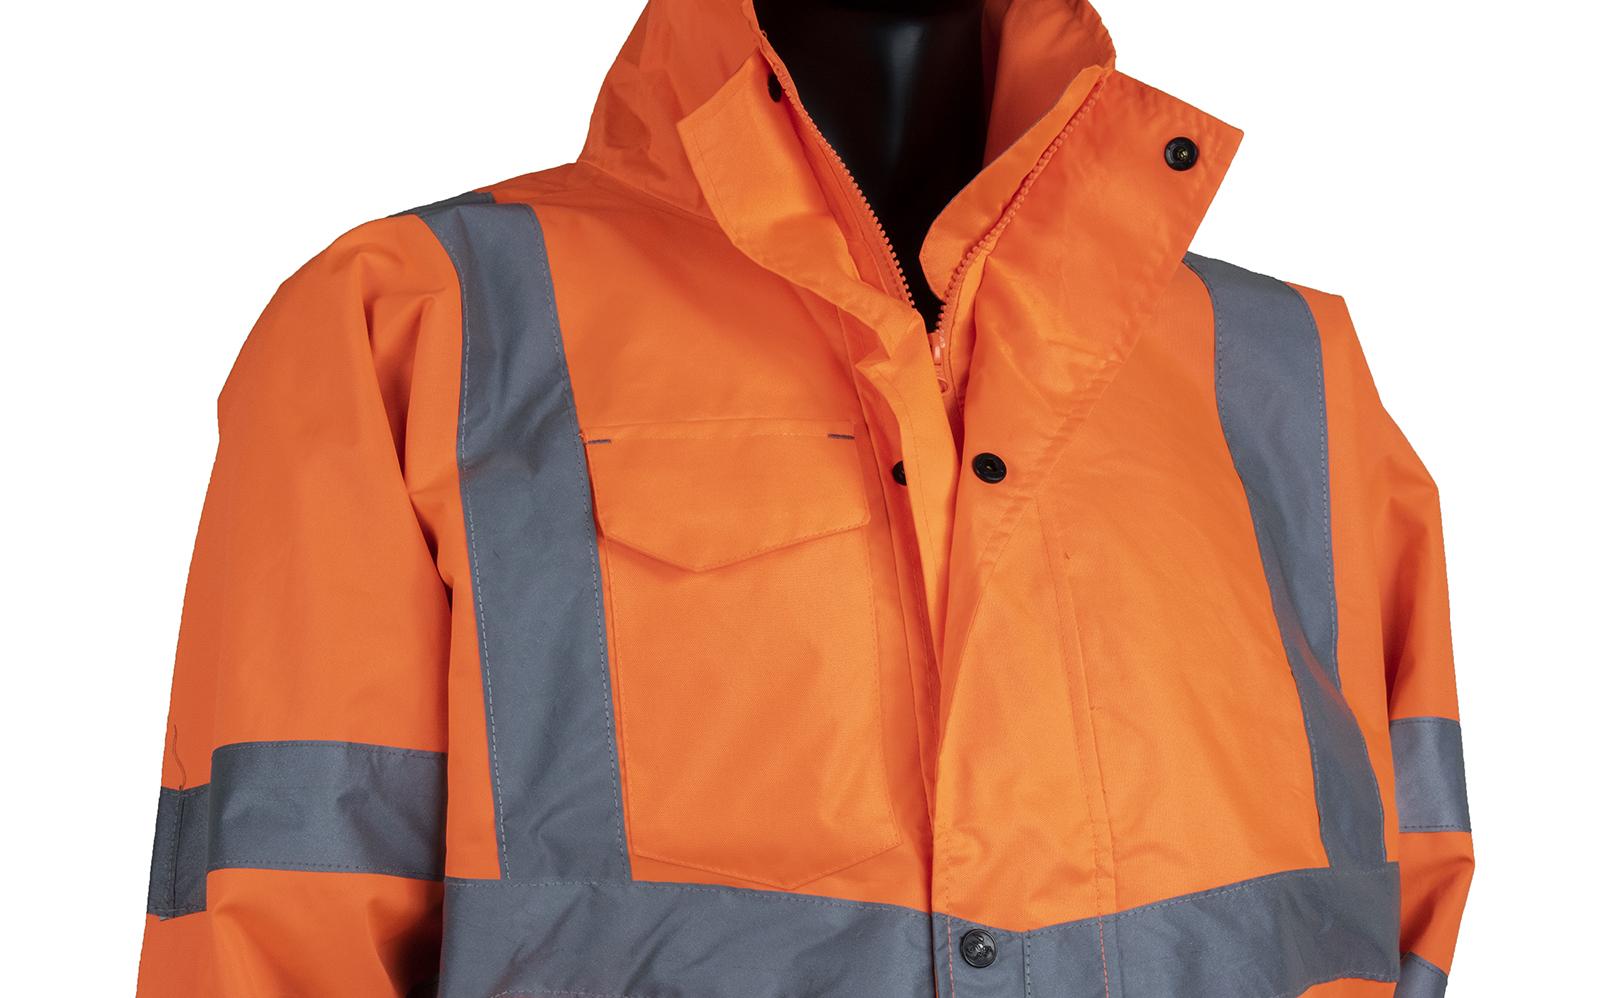 Railguard Waterproof Bomber Jacket W/ Contoured Neckline With Storm Collar